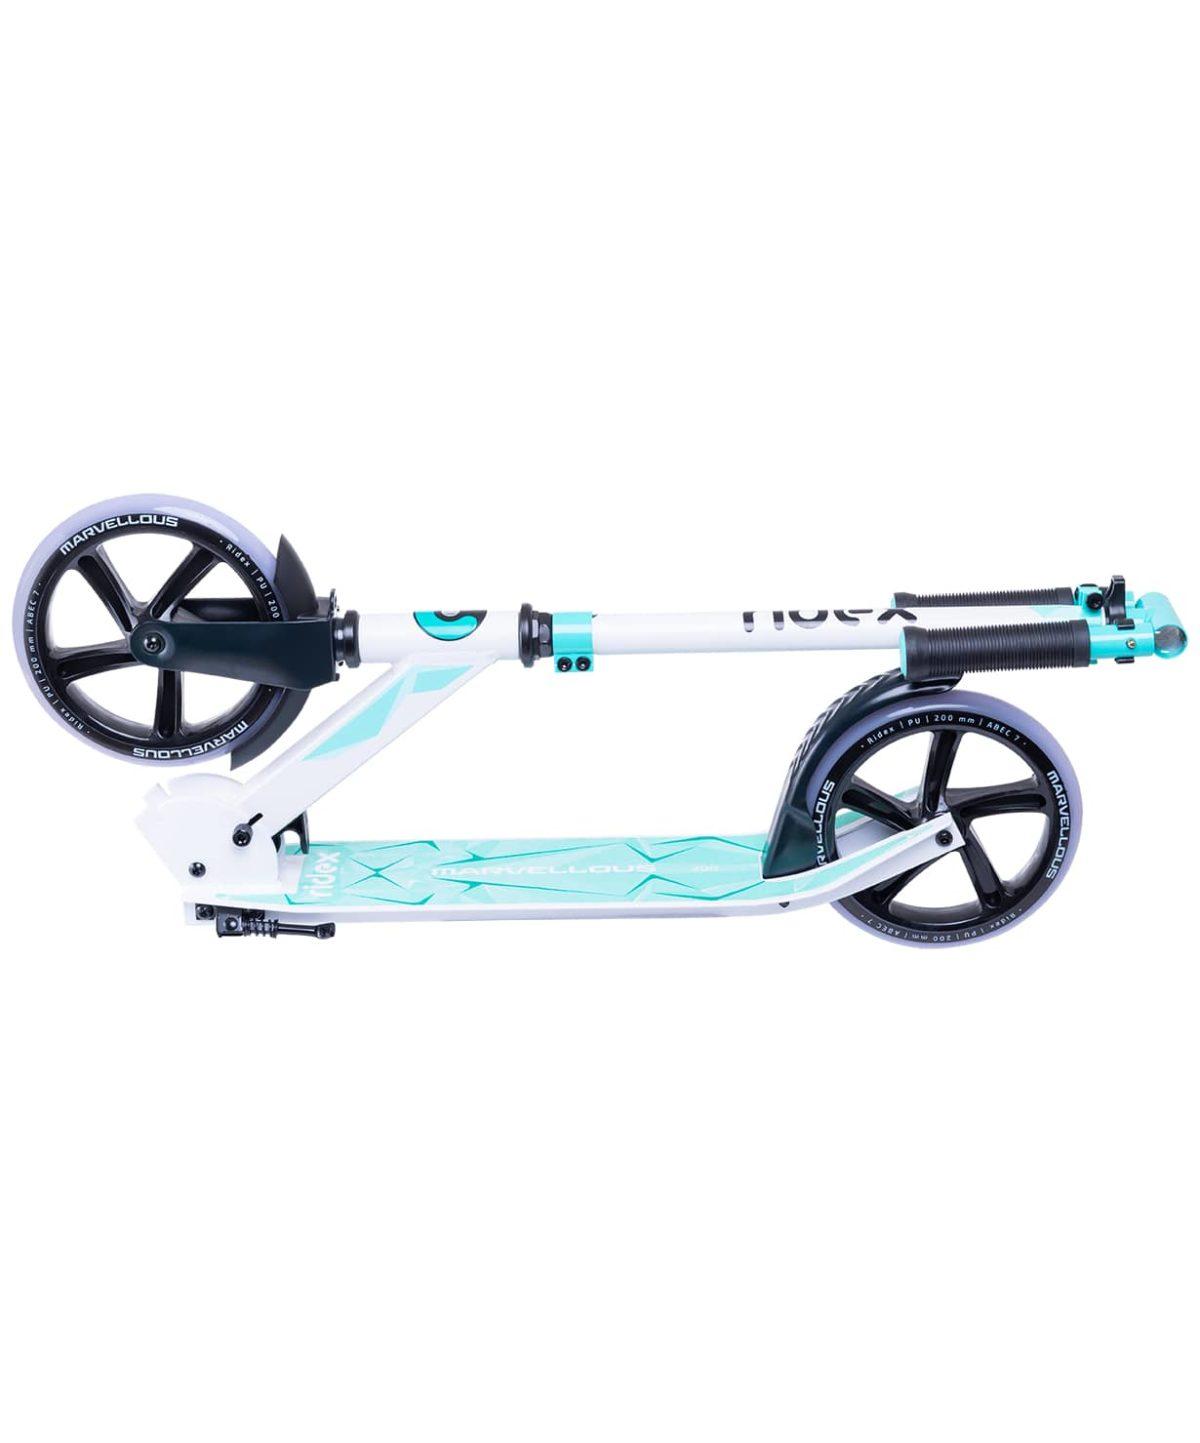 RIDEX Marvellous Самокат 2-х колес. 200 мм  Marvellous: белый/мятный - 4